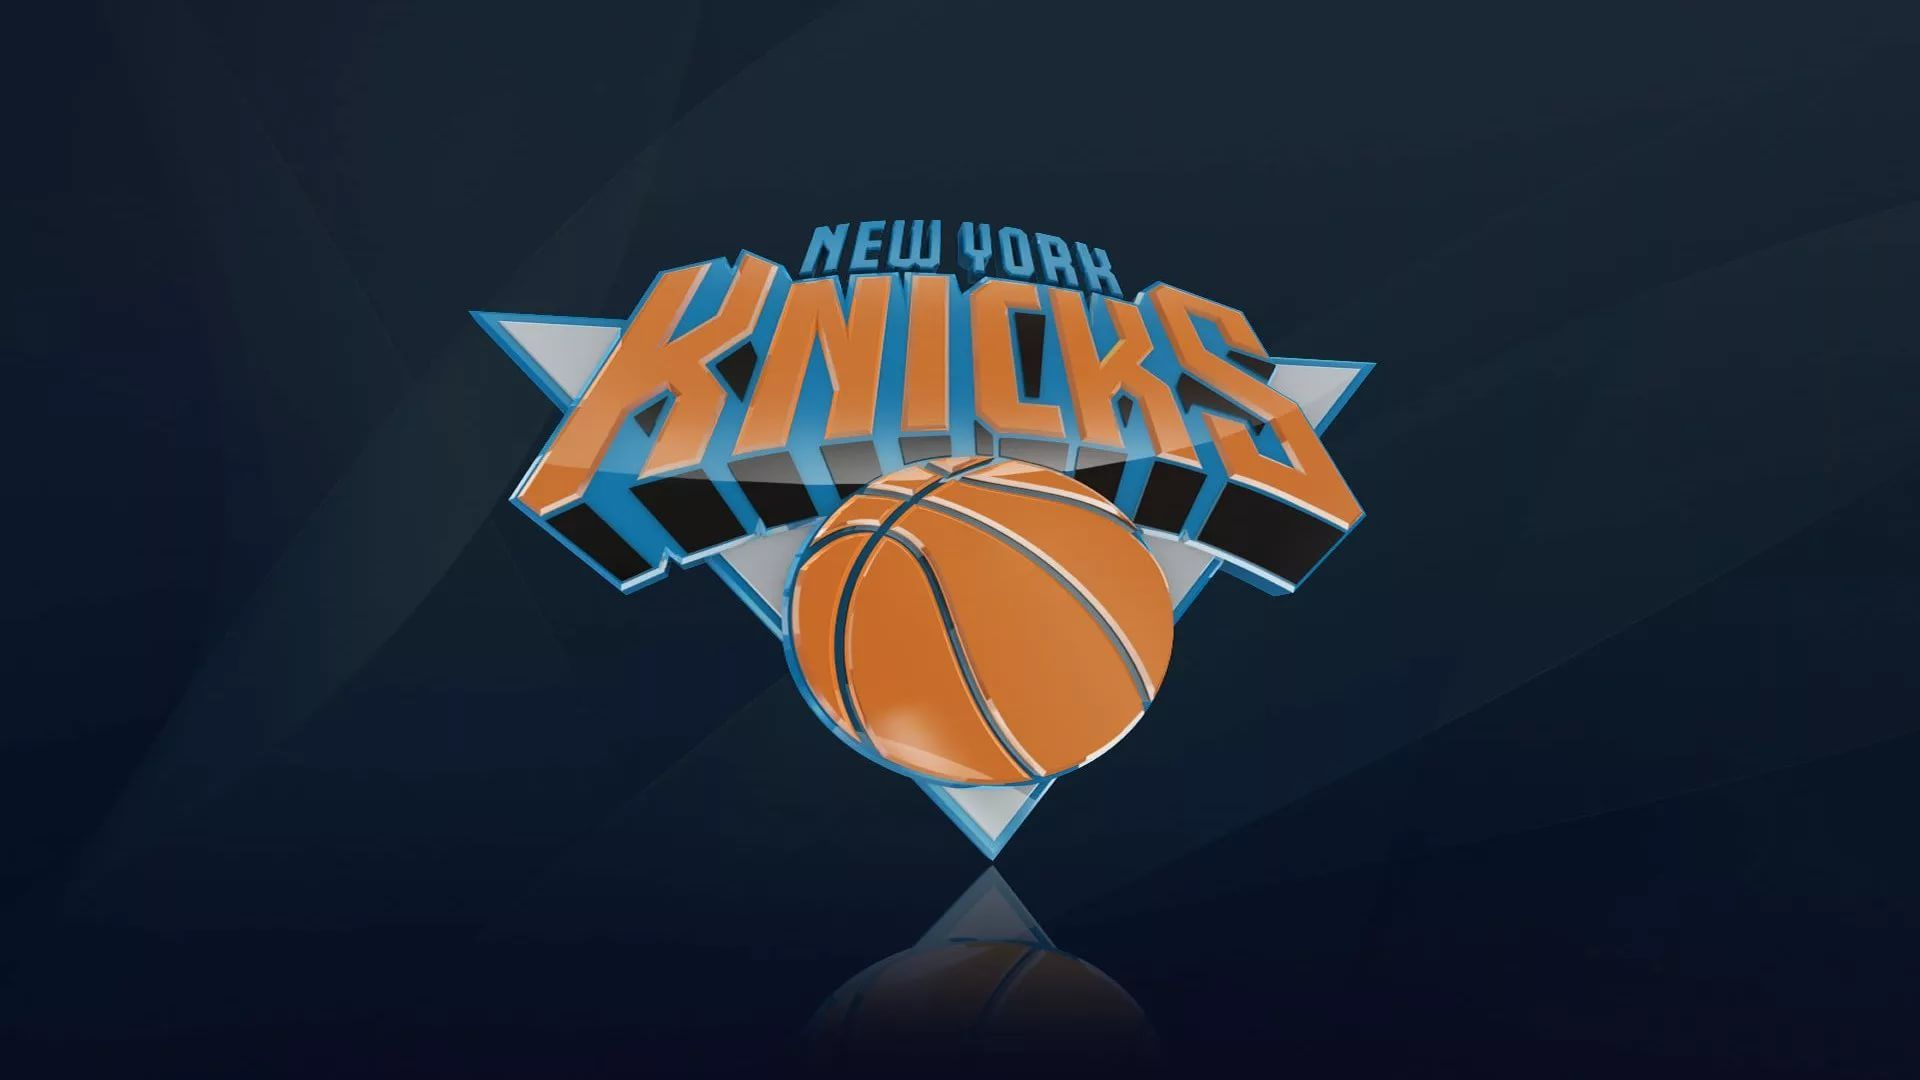 New York Knicks good wallpaper